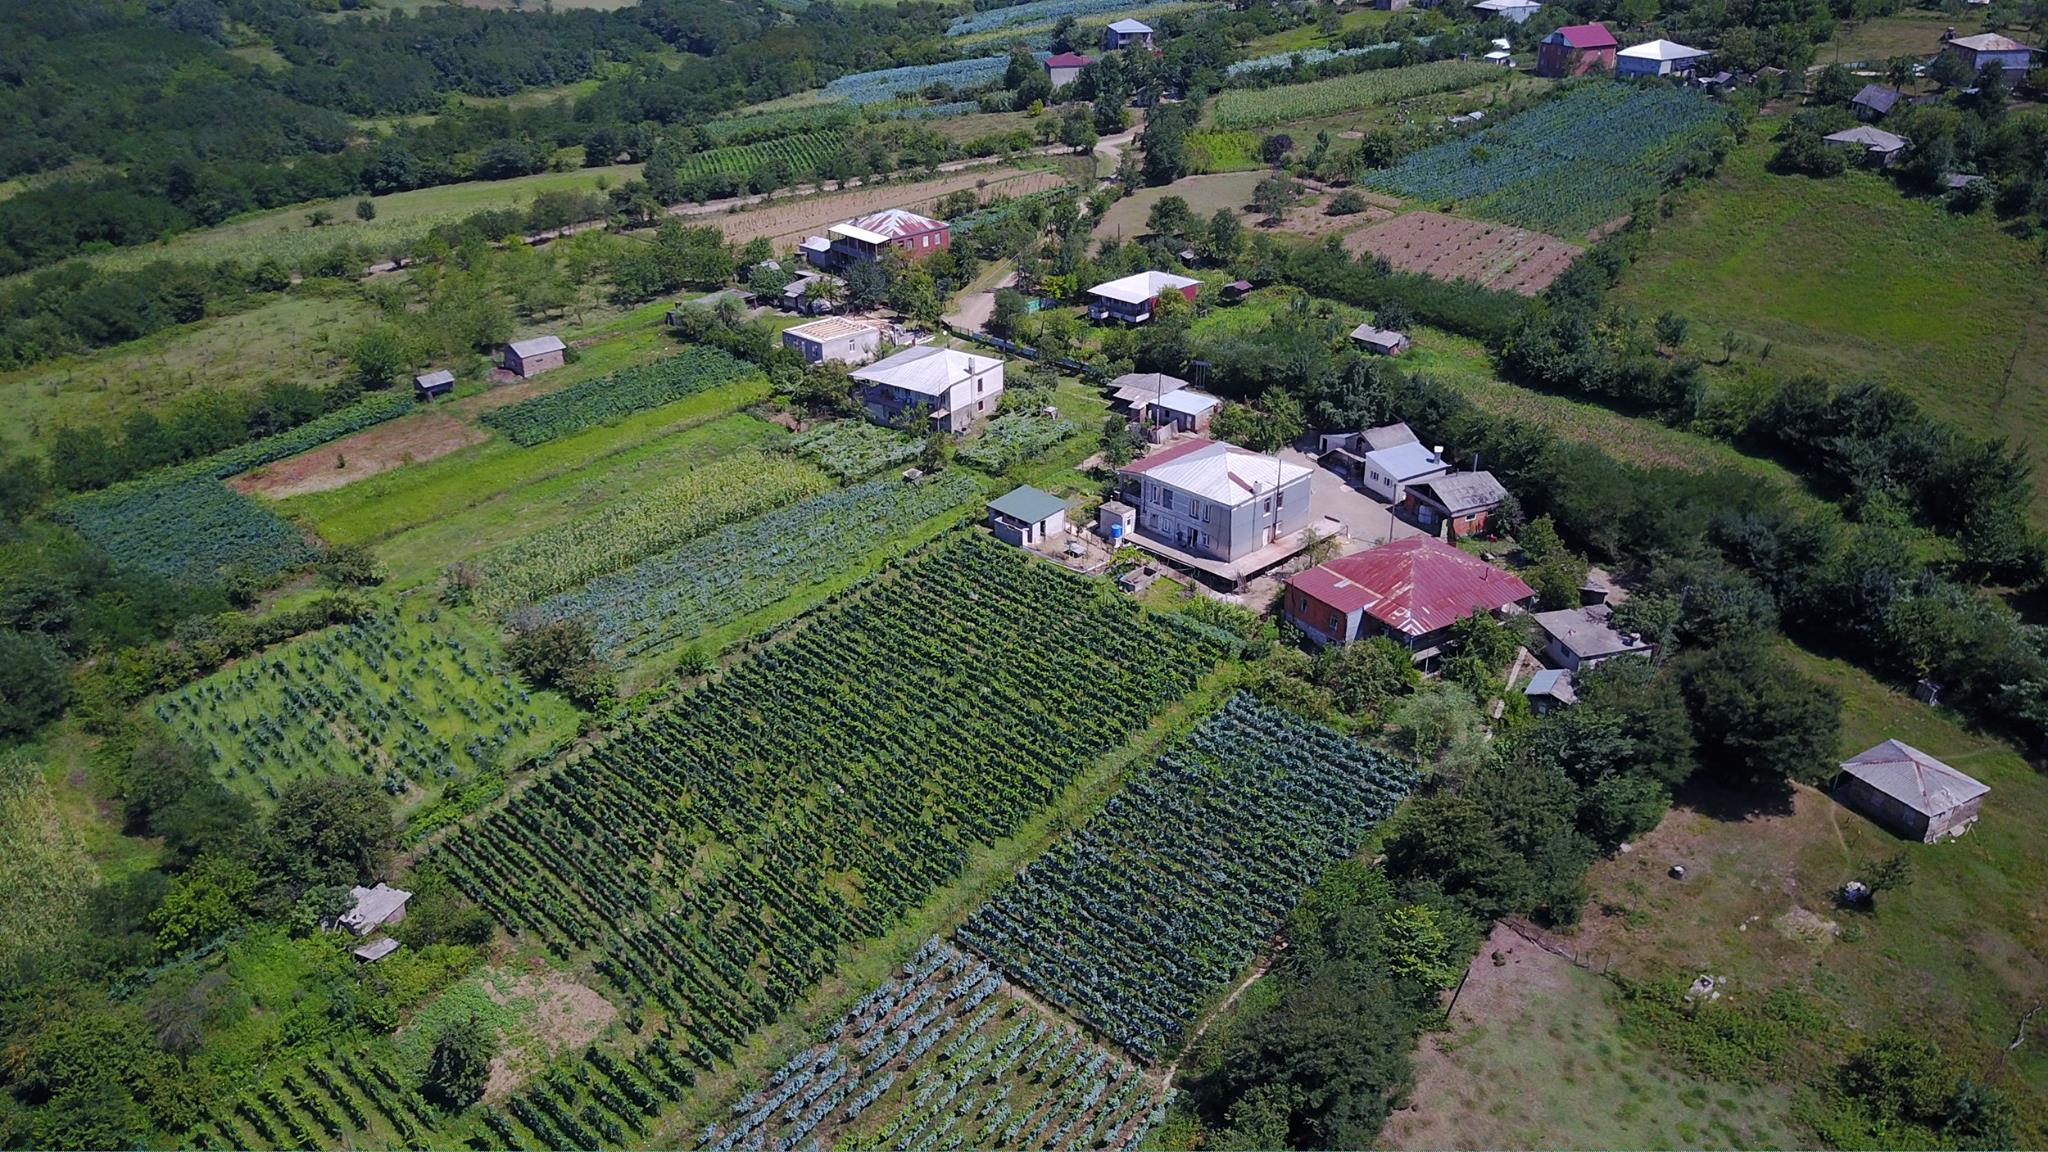 An overview of Baia's organic vineyard growing Tstitska, Tsolikouri and Krakhuna grapes for white, amber and orange Georgian wine